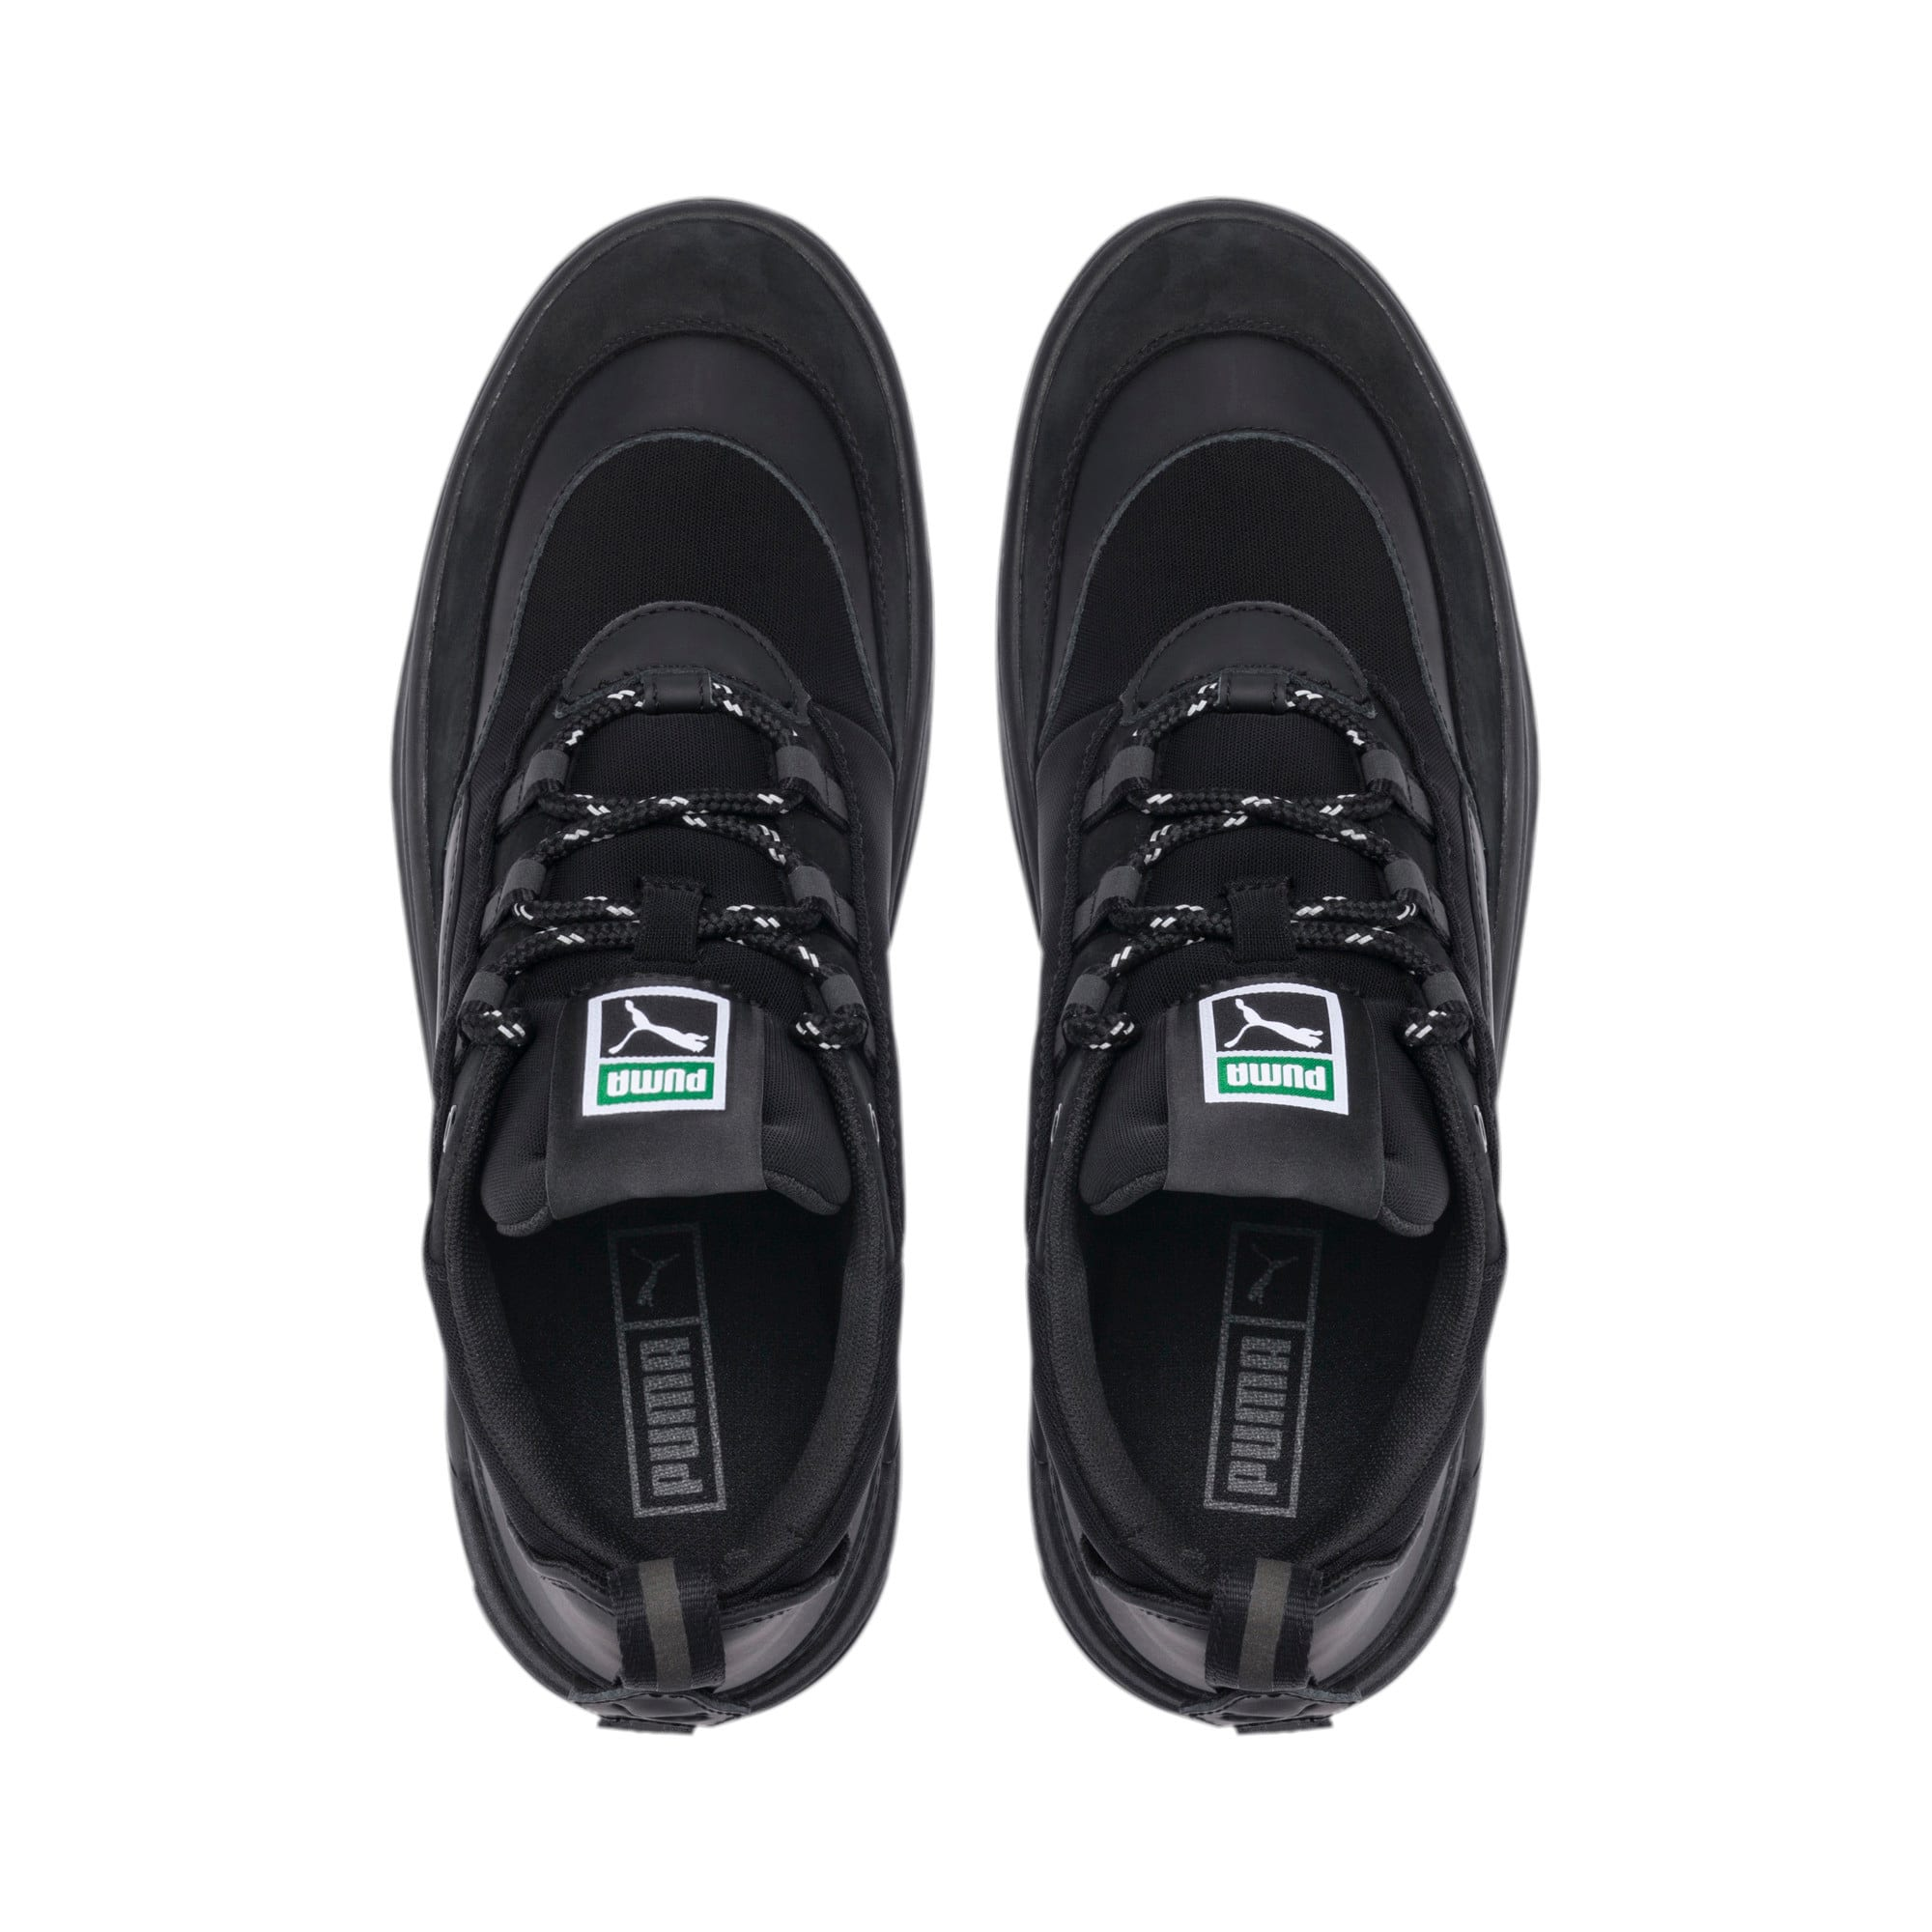 Thumbnail 6 of Cali Zero Demi Triple Black Sneakers, Puma Black-Puma Black, medium